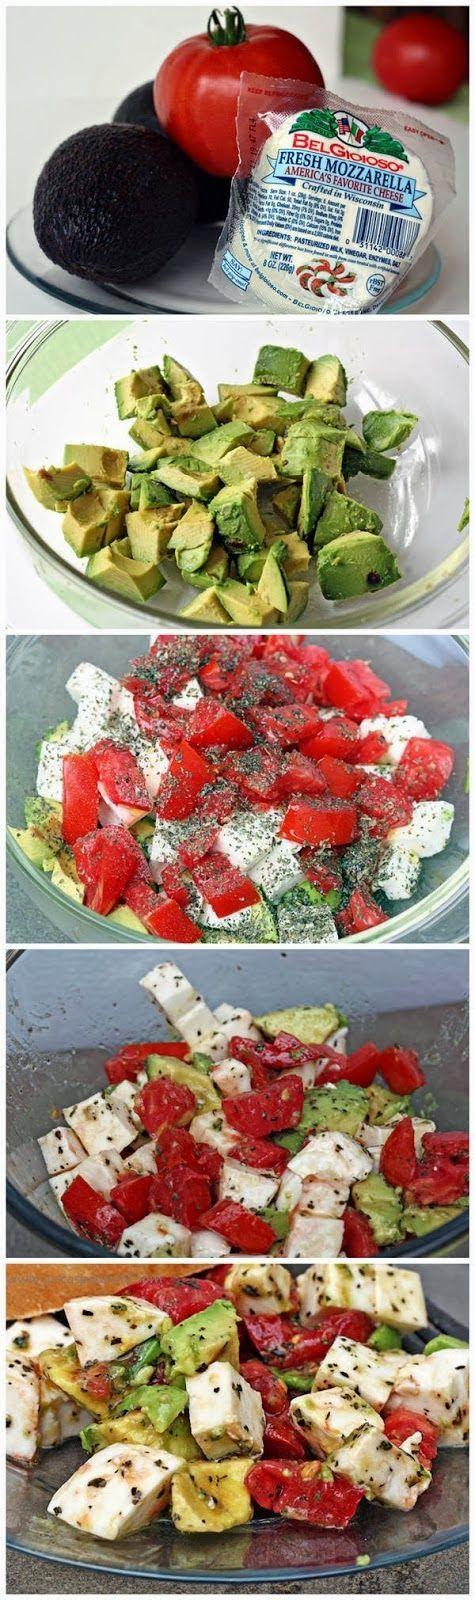 Mozzarella Salad Avocado / Tomato/